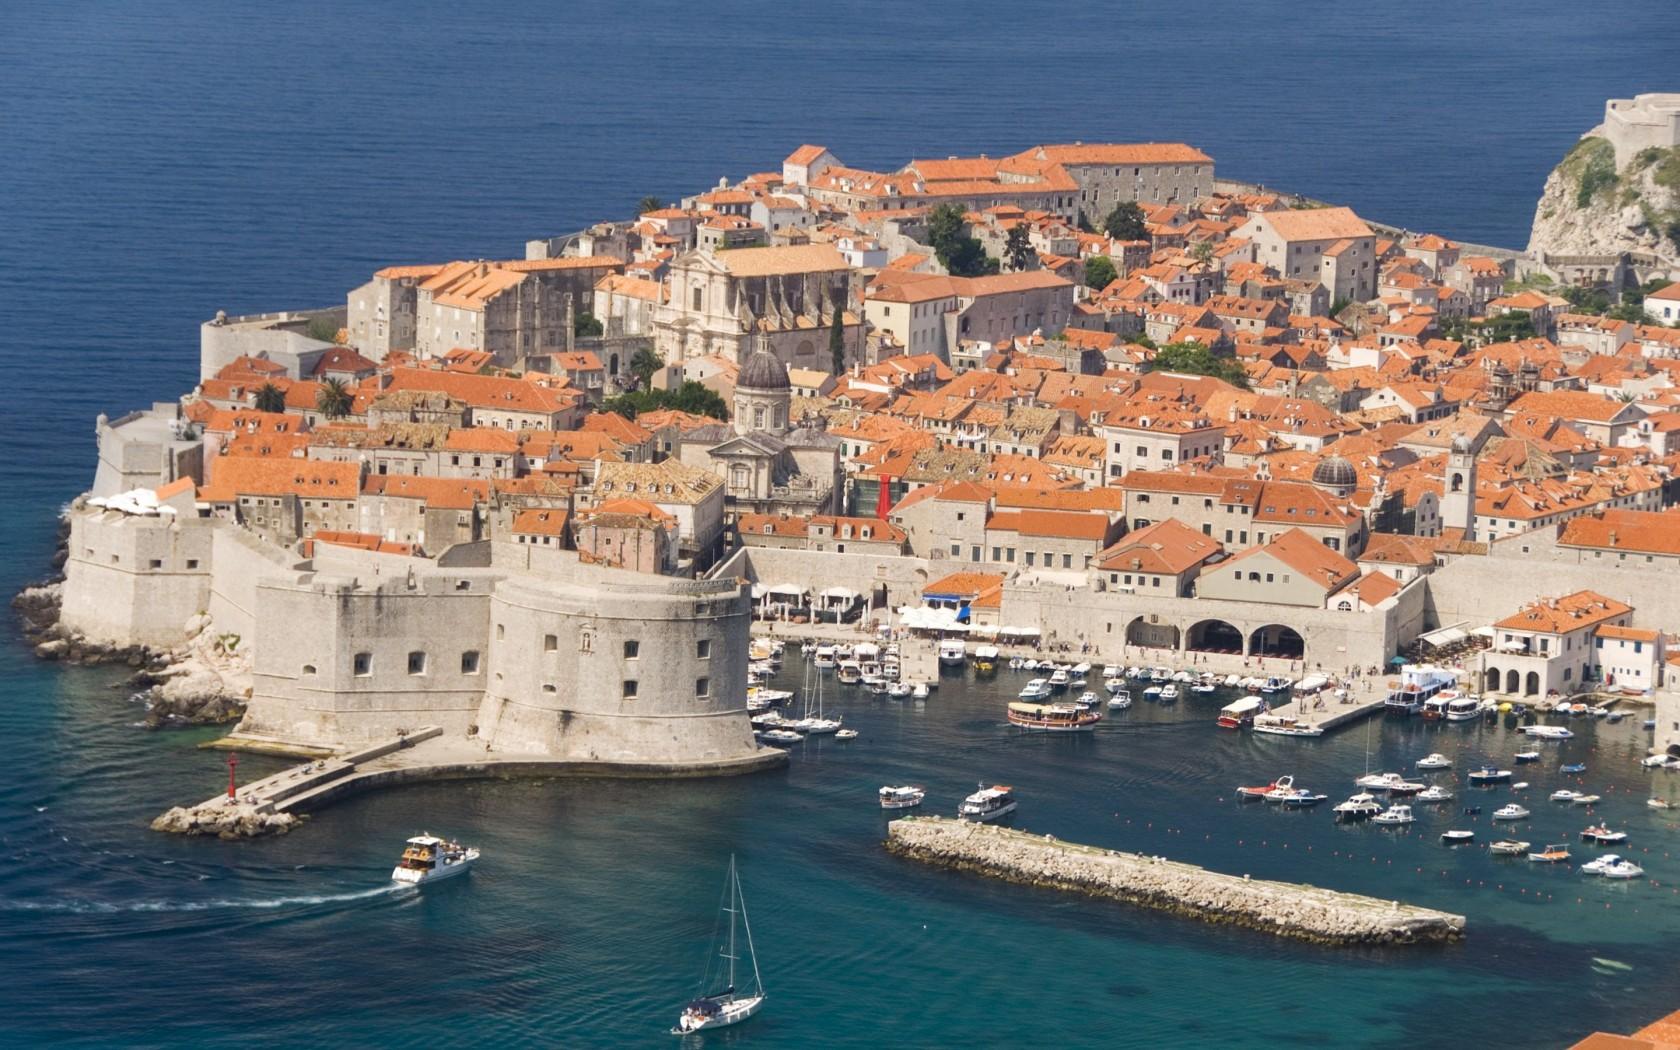 Game of Thrones Filming Location - Dubrovnik, Croatia